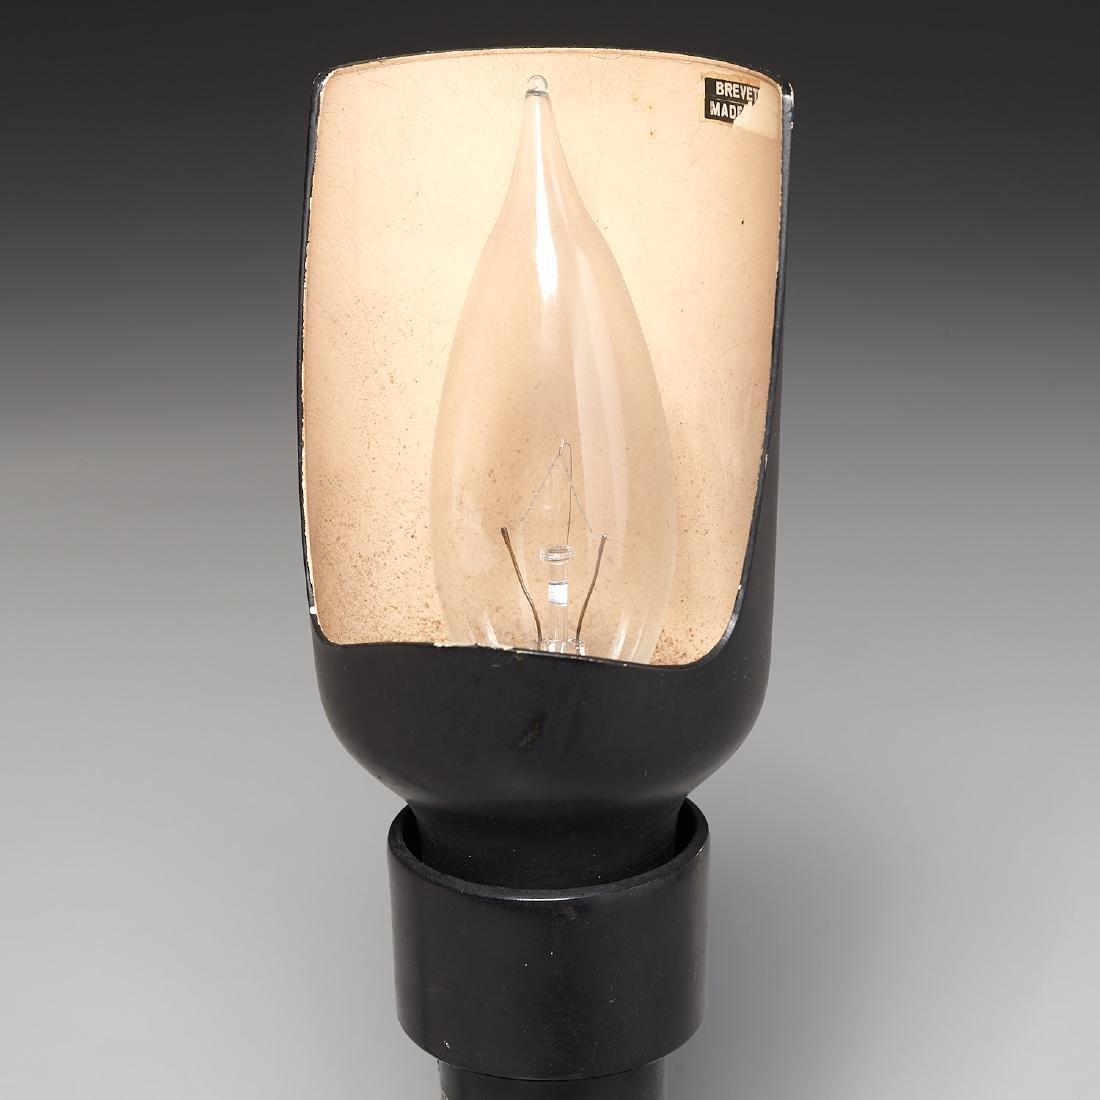 Pair Gino Sarfatti table lamps - 2